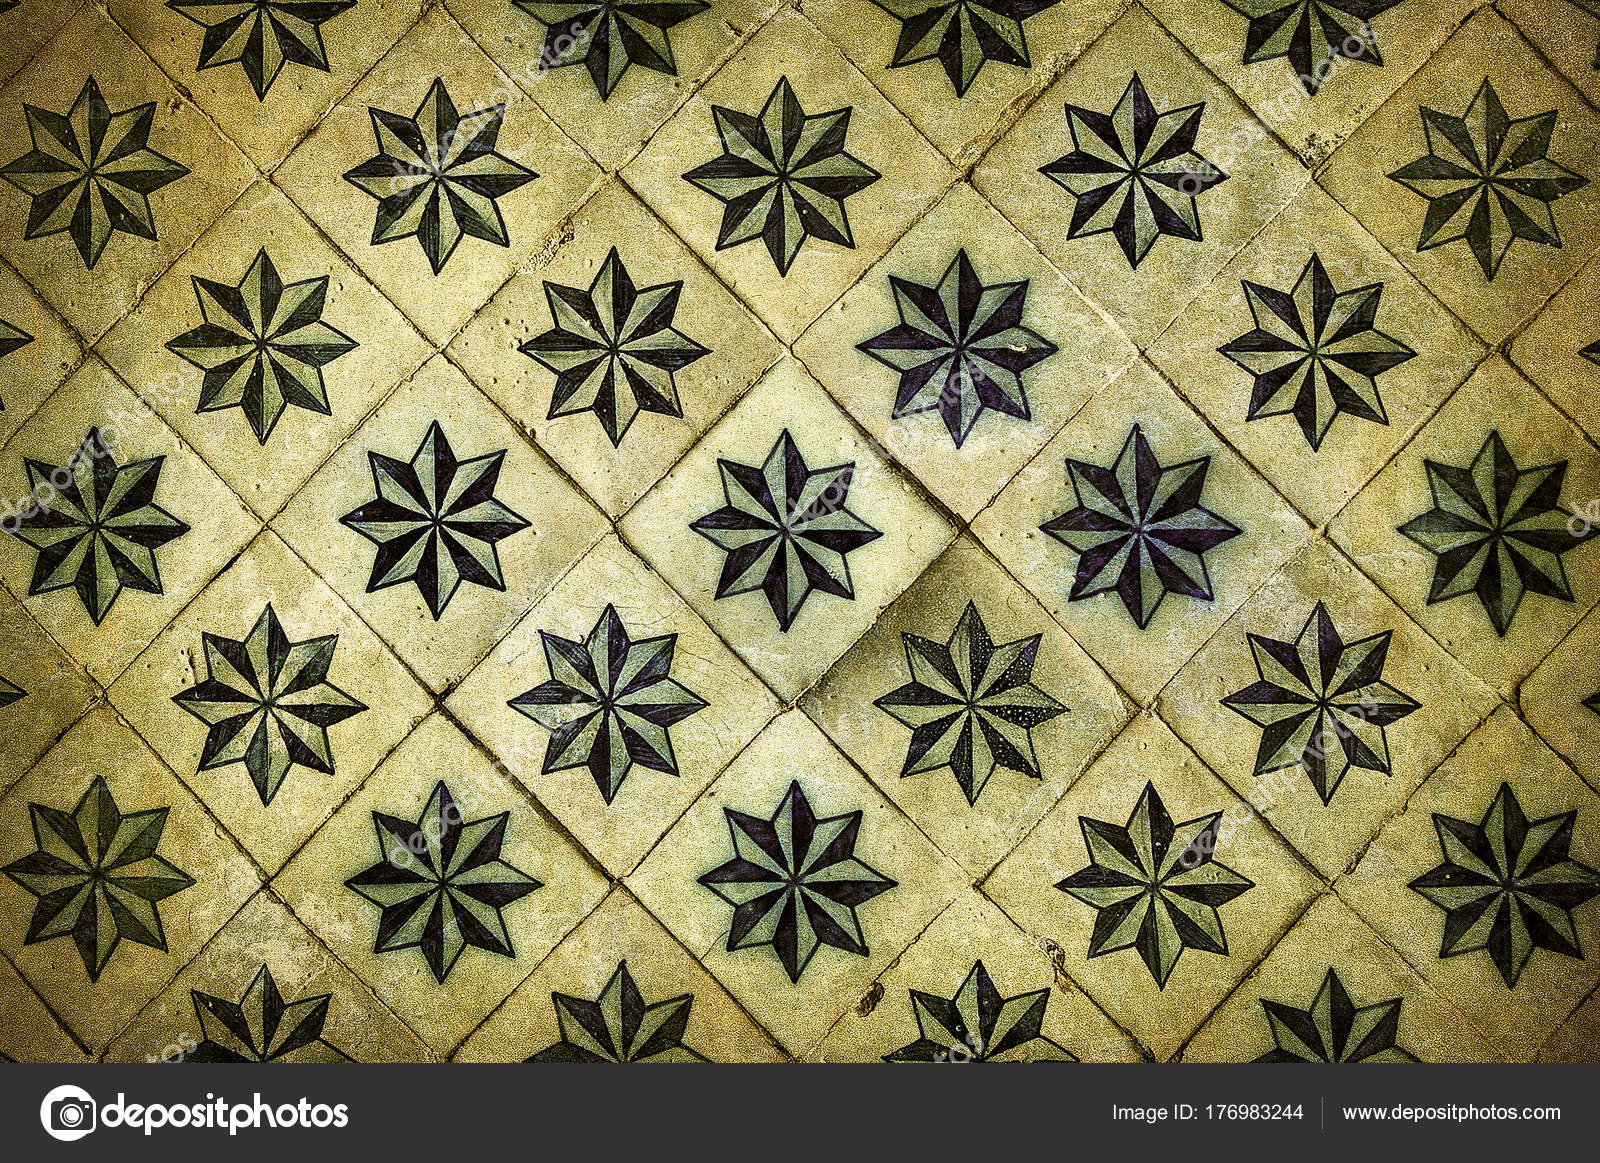 Vintage azulejos piastrelle portoghesi tradizionali u foto stock